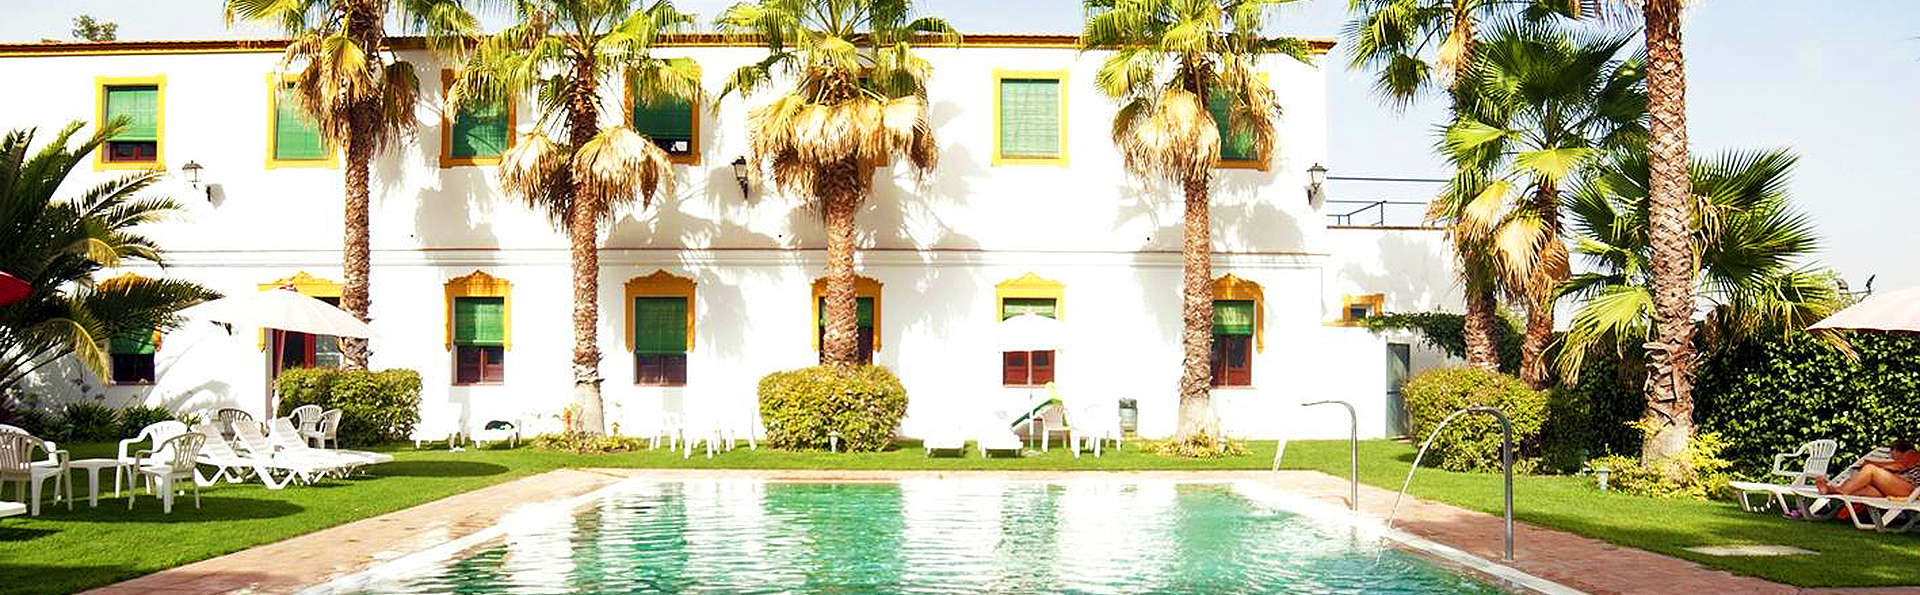 Hotel Balneario El Raposo - EDIT_Pool1.jpg